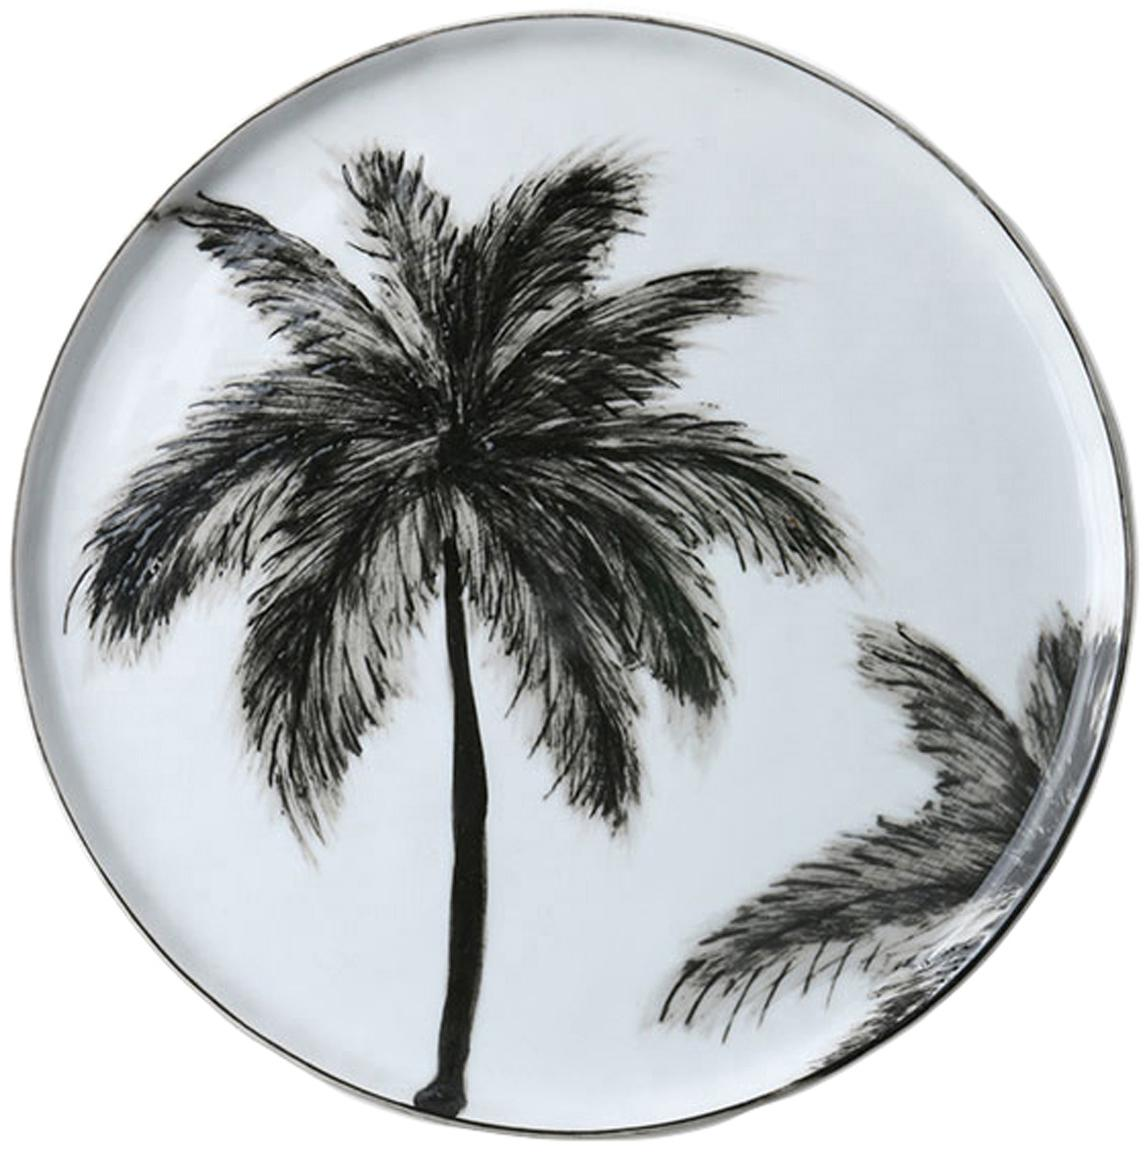 Piattino da dessert Palms 2 pz, Porcellana, Nero, bianco, Ø 22 cm